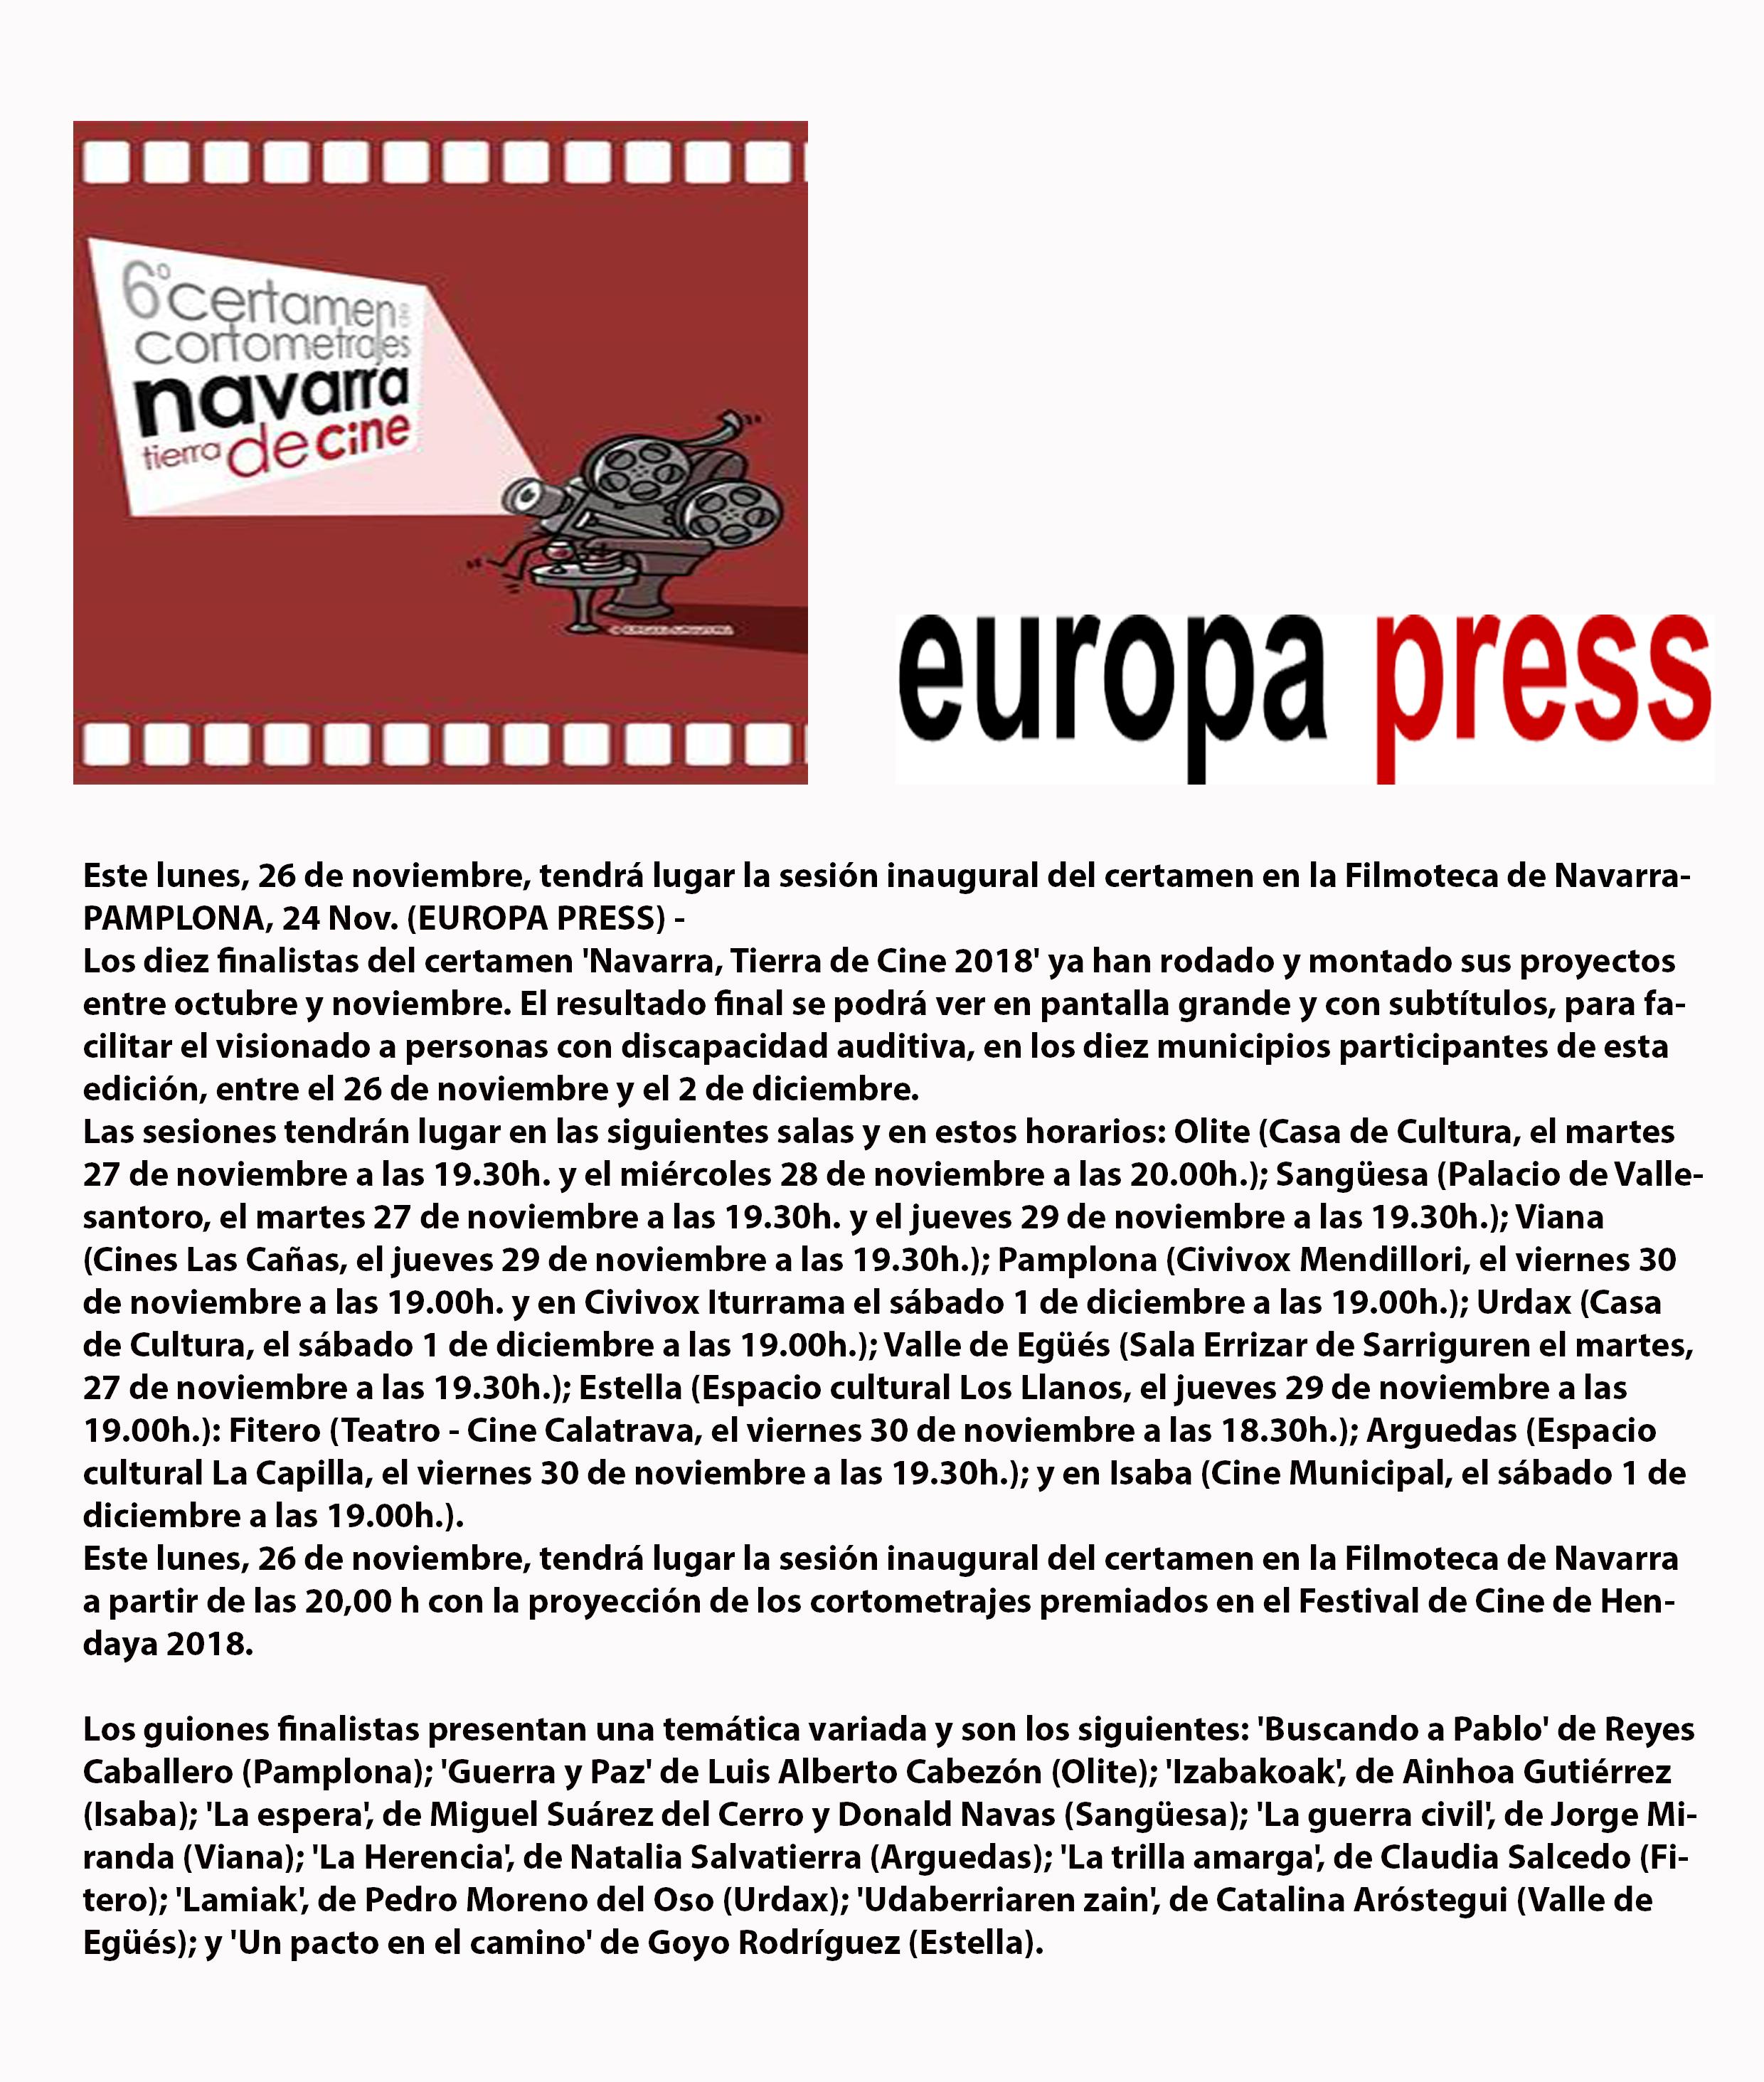 EUROPA-PRESS